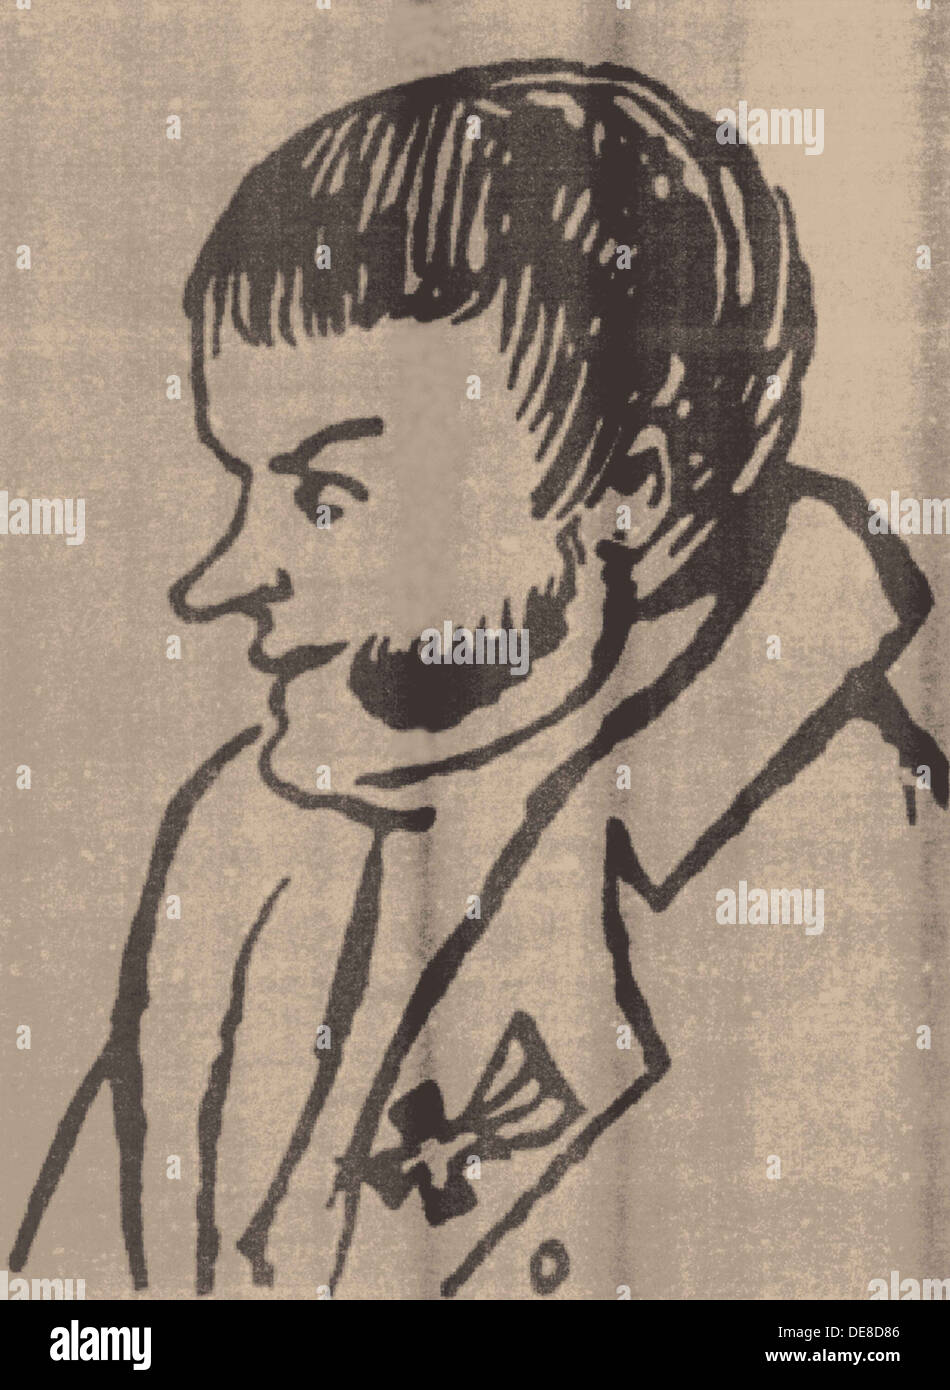 Alexander Petrovich Kunitsyn (1783-1840) Detail of a caricature, 1816. Artist: Illichevsky, Alexey Demyanovich (1798-1837) - Stock Image